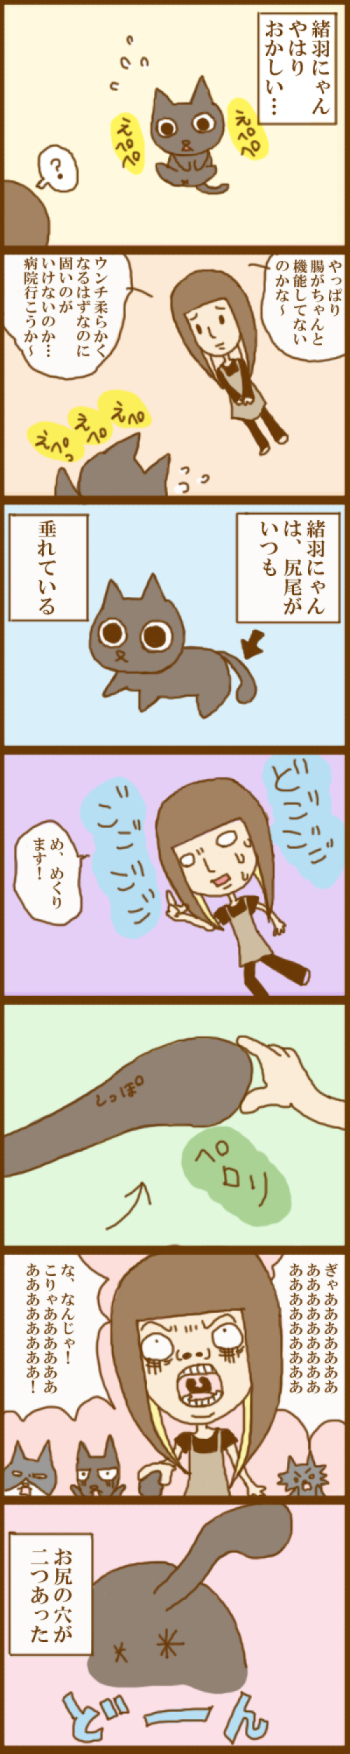 f:id:suzuokayu:20201118104820j:plain